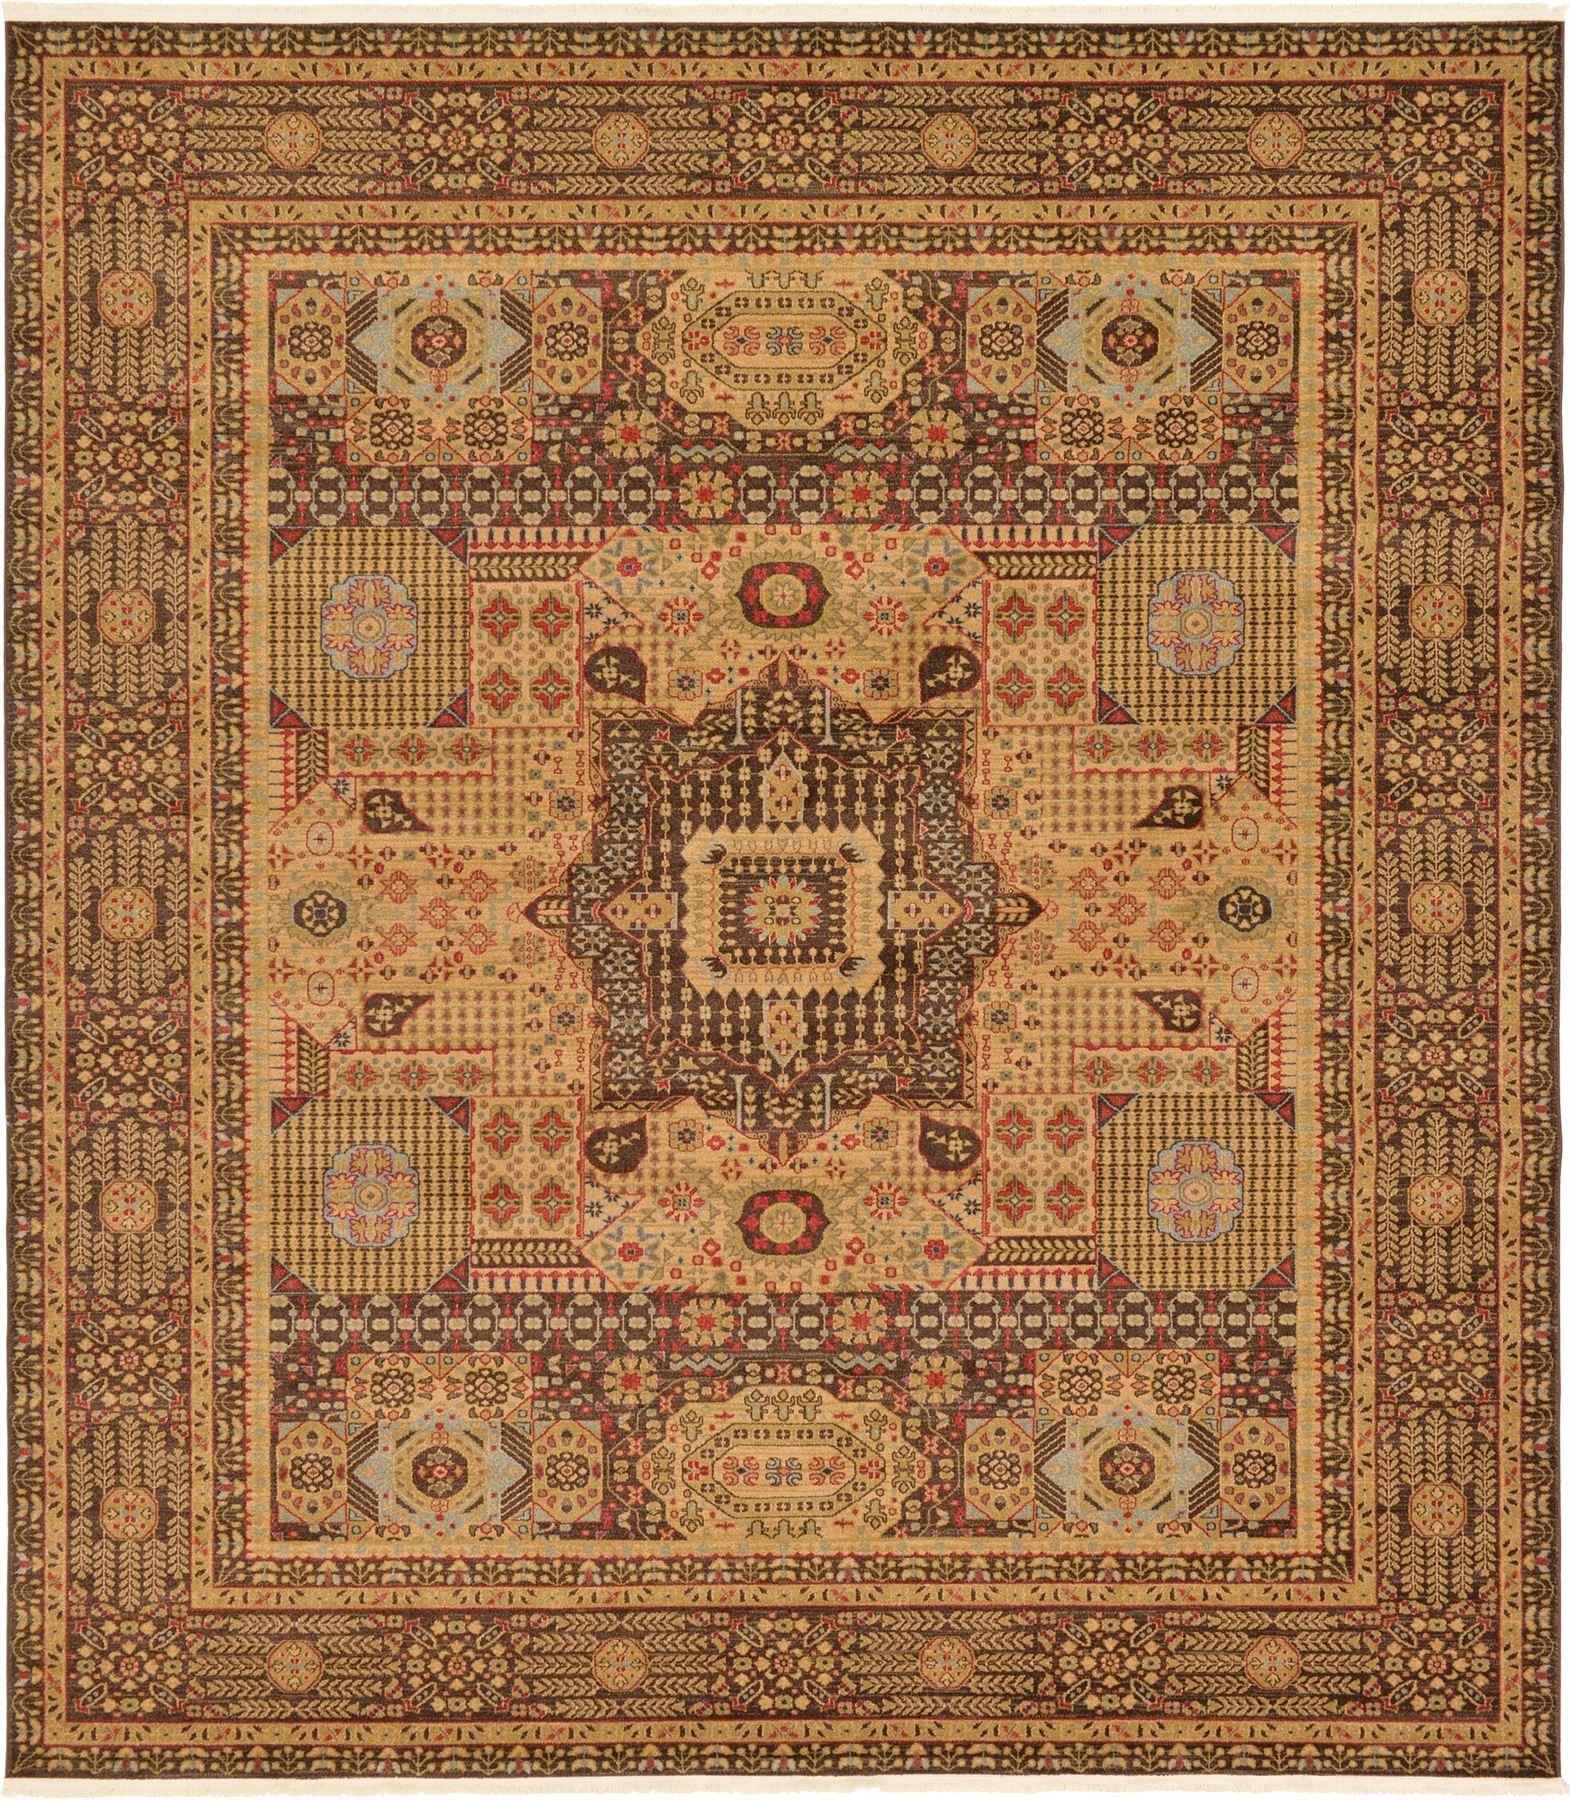 Medallion Carpet Traditional Rugs Floral Area Rug Vintage